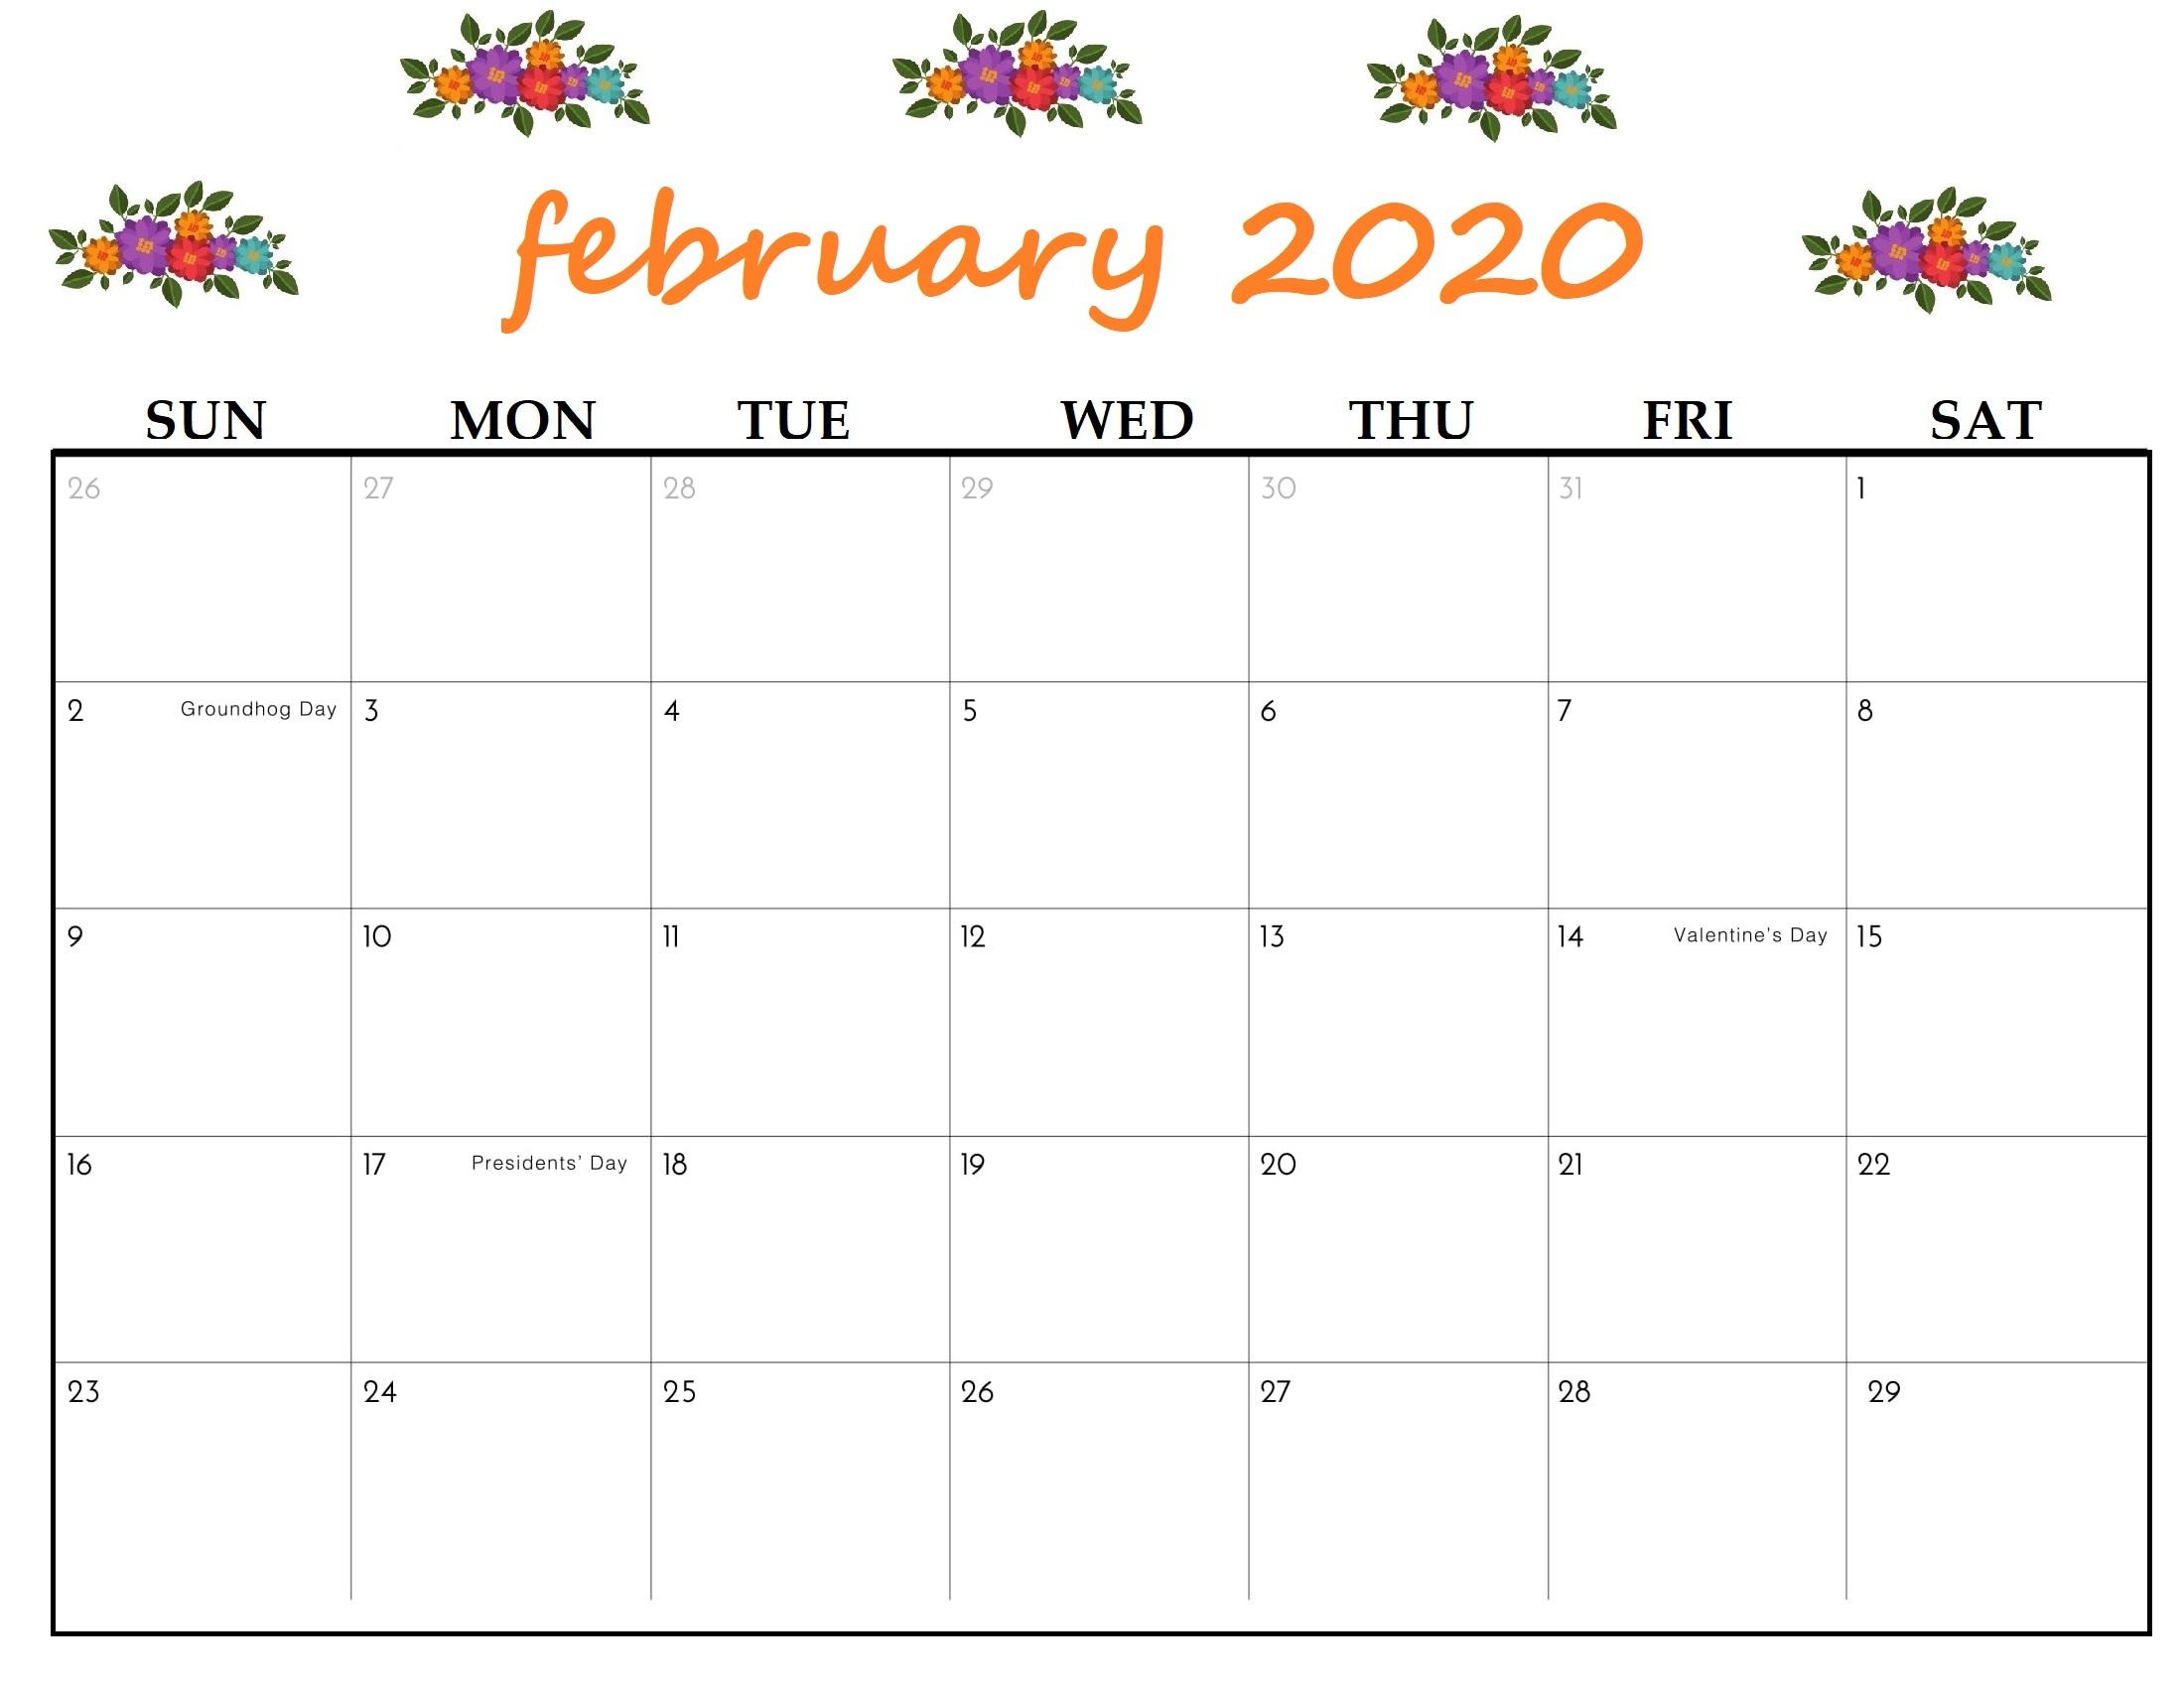 February 2020 PDF Floral Calendar Template